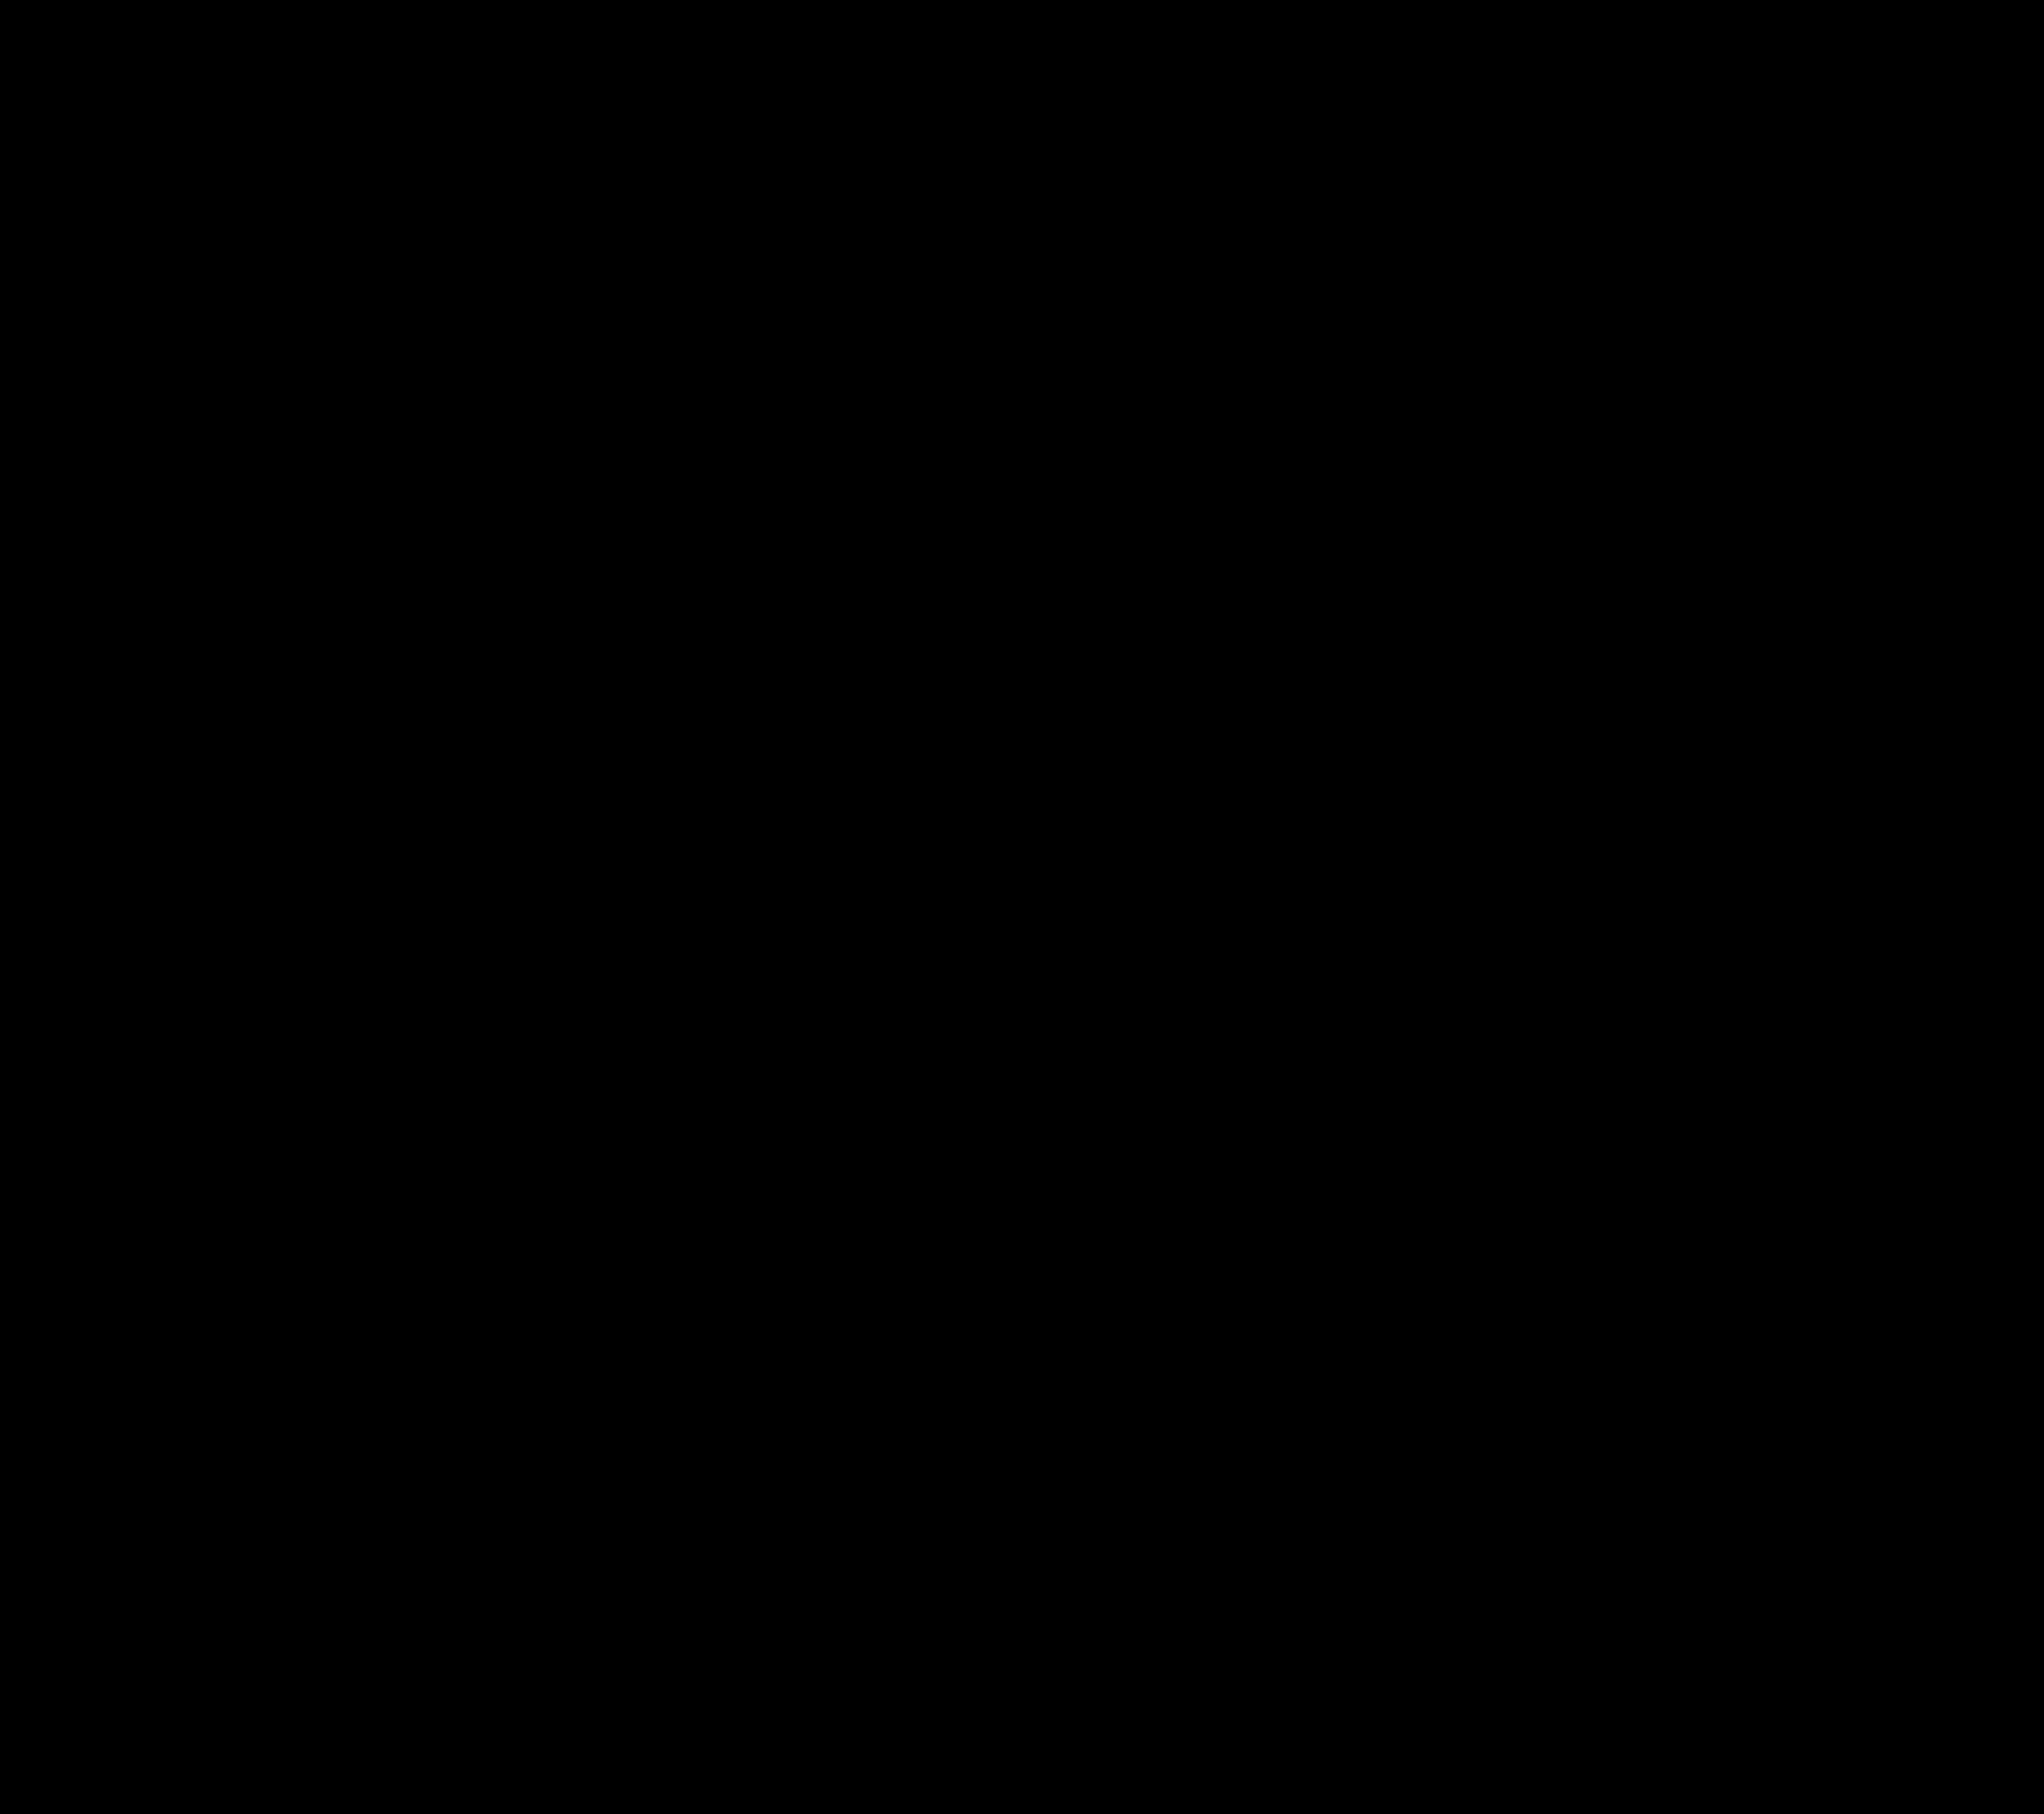 svg-2